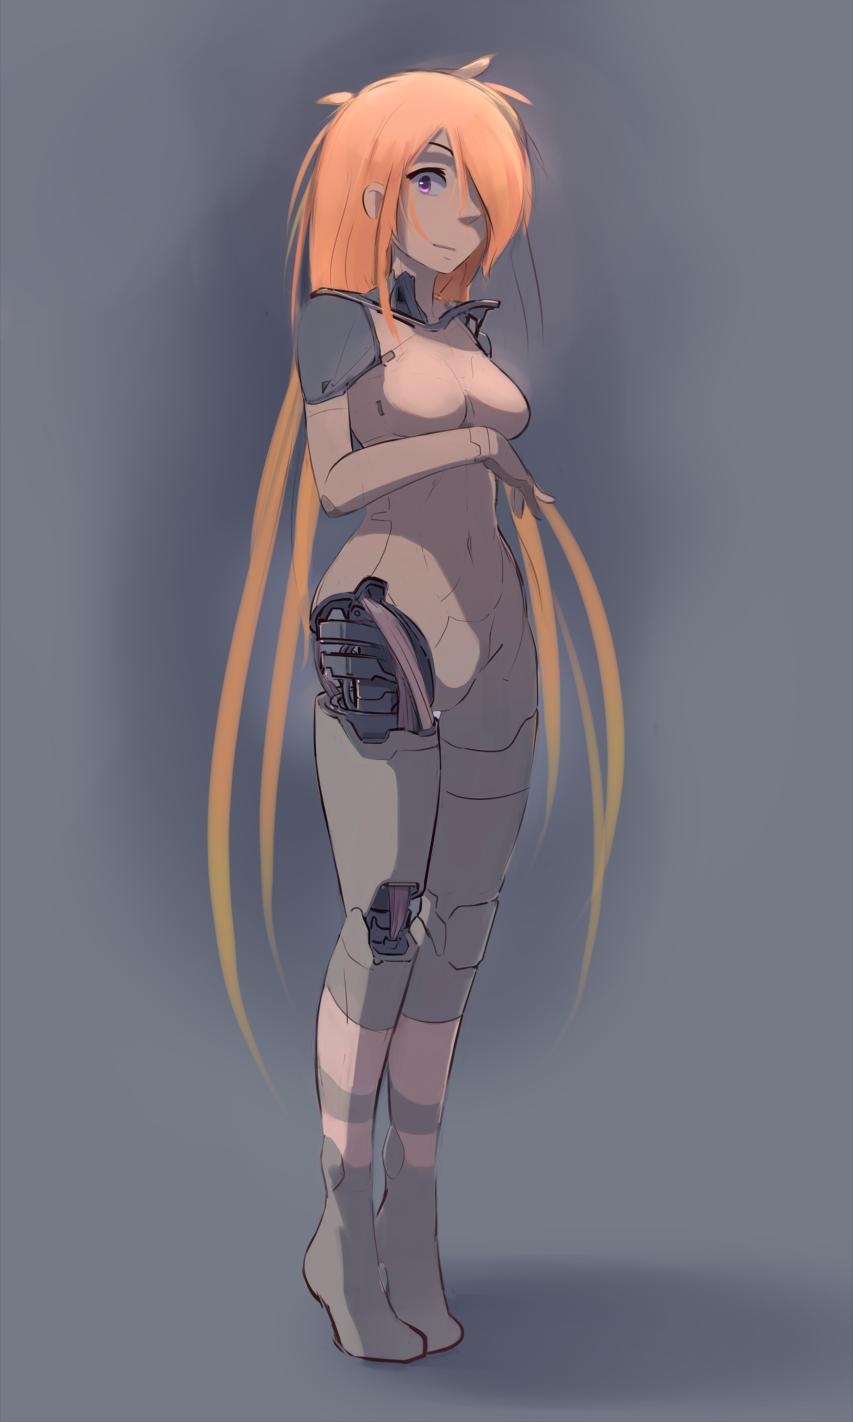 by nradiowave, подборка Наброски персонажей, #девушка #андроид #рисунки #cyborg